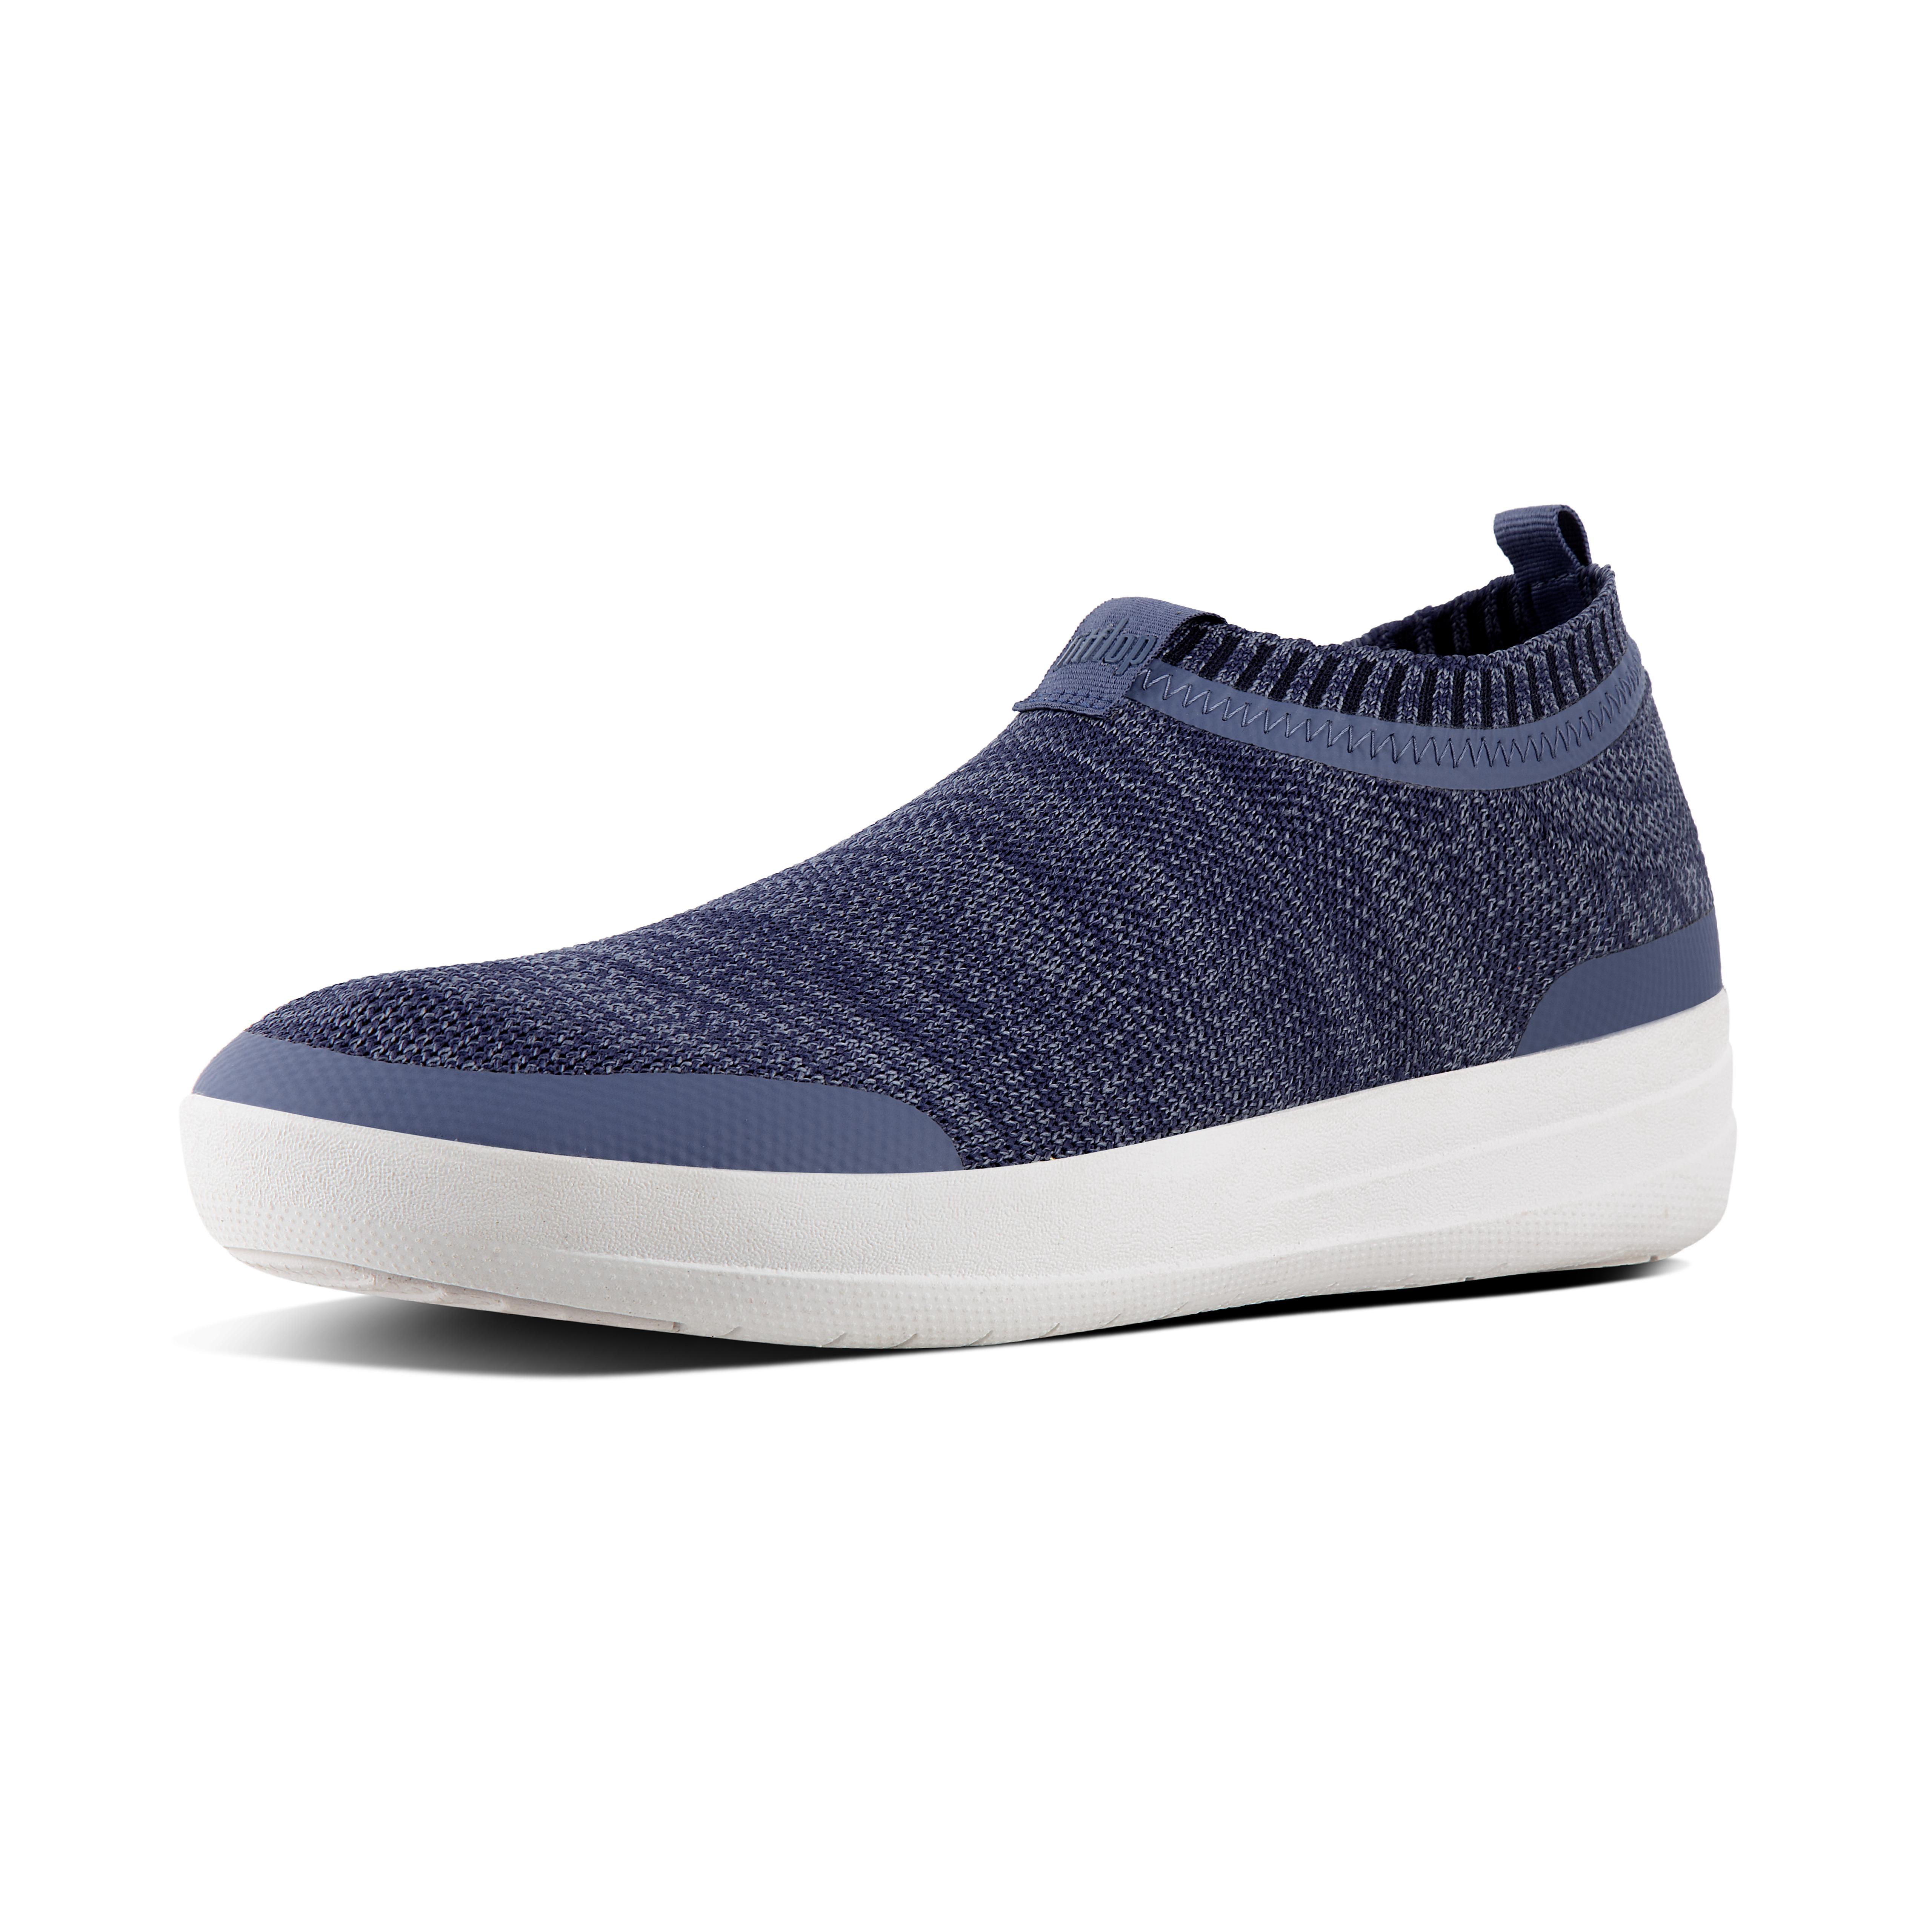 Uberknit slip on sneakers indian blue powder blue l30 564